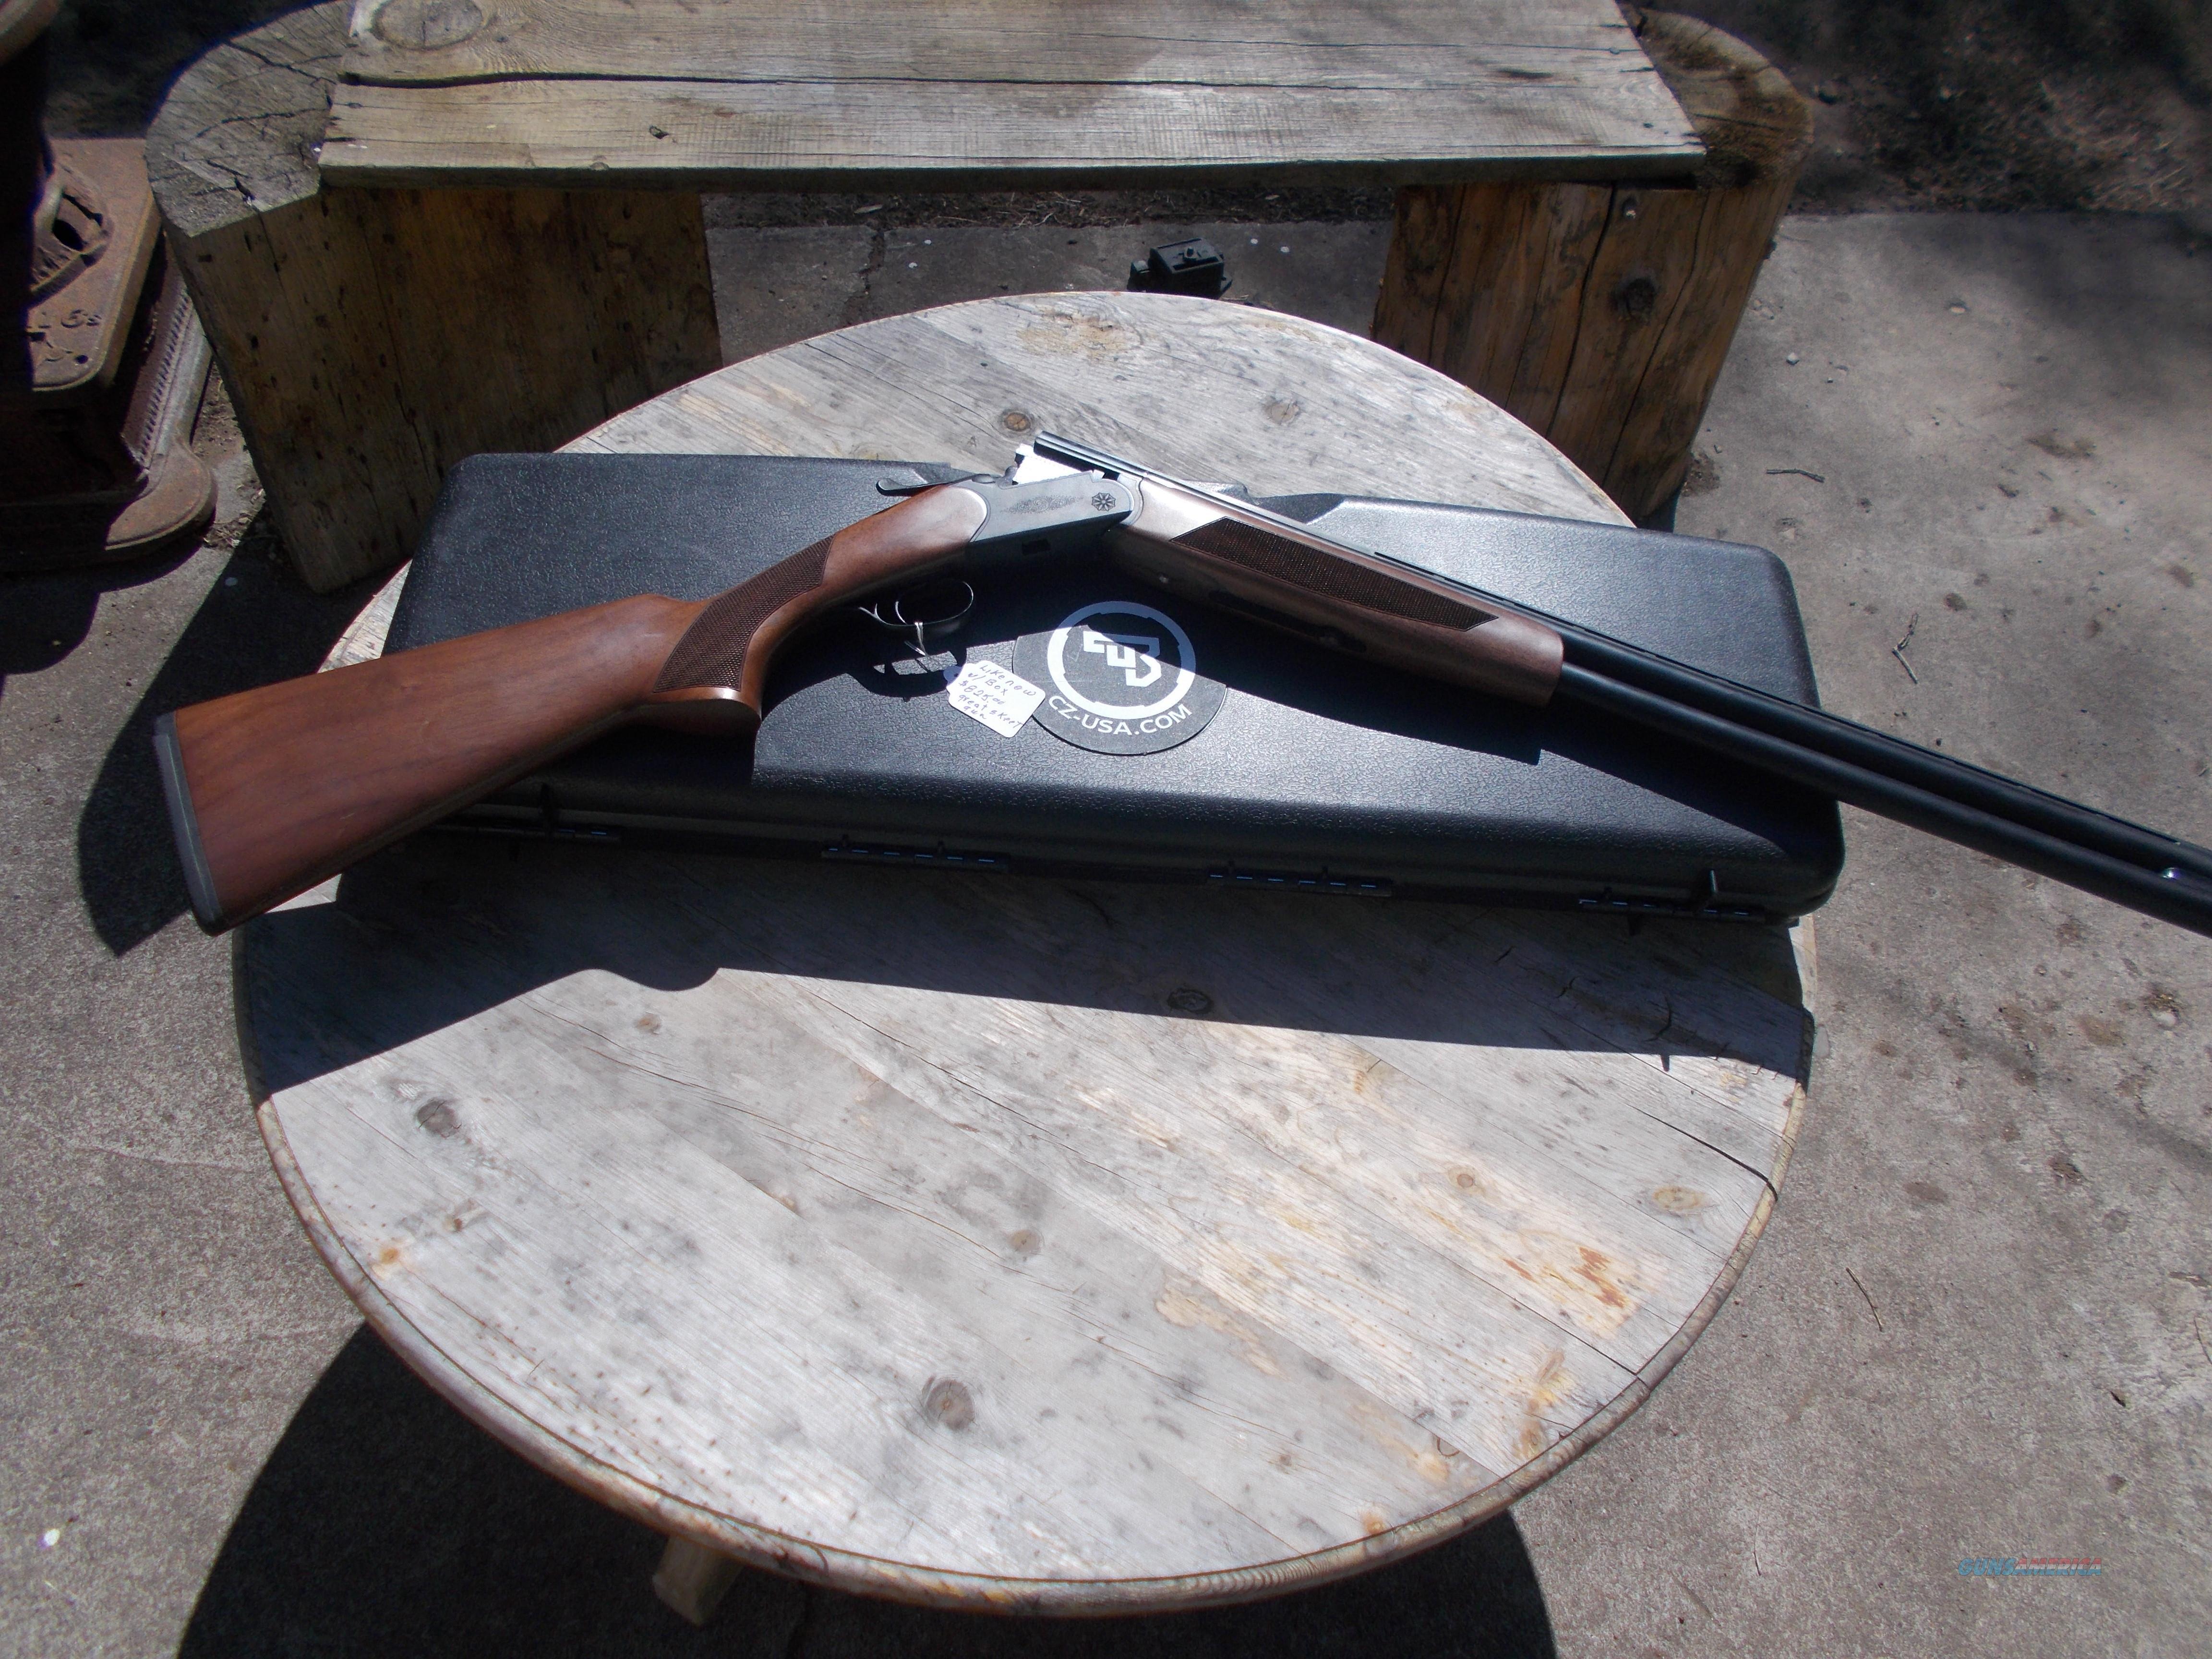 CZ O/U drake g-2 12 guage  Guns > Shotguns > CZ Shotguns